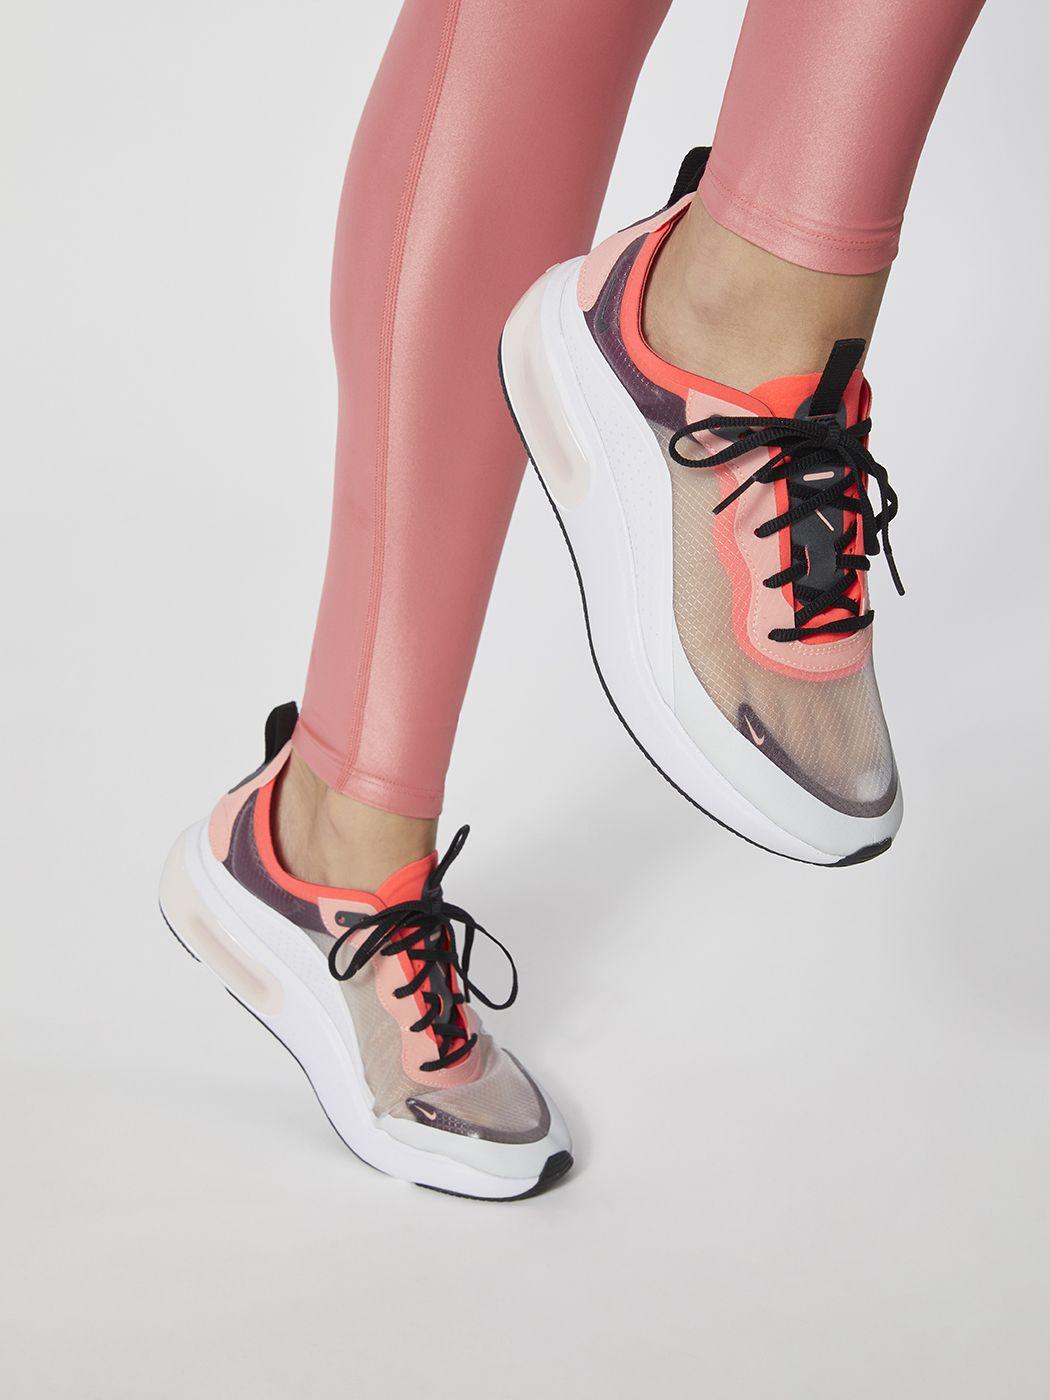 37d3cb3df6c44 Nike W NIKE AIR MAX DIA SE QS - Off white Black-white-flash crimson ...